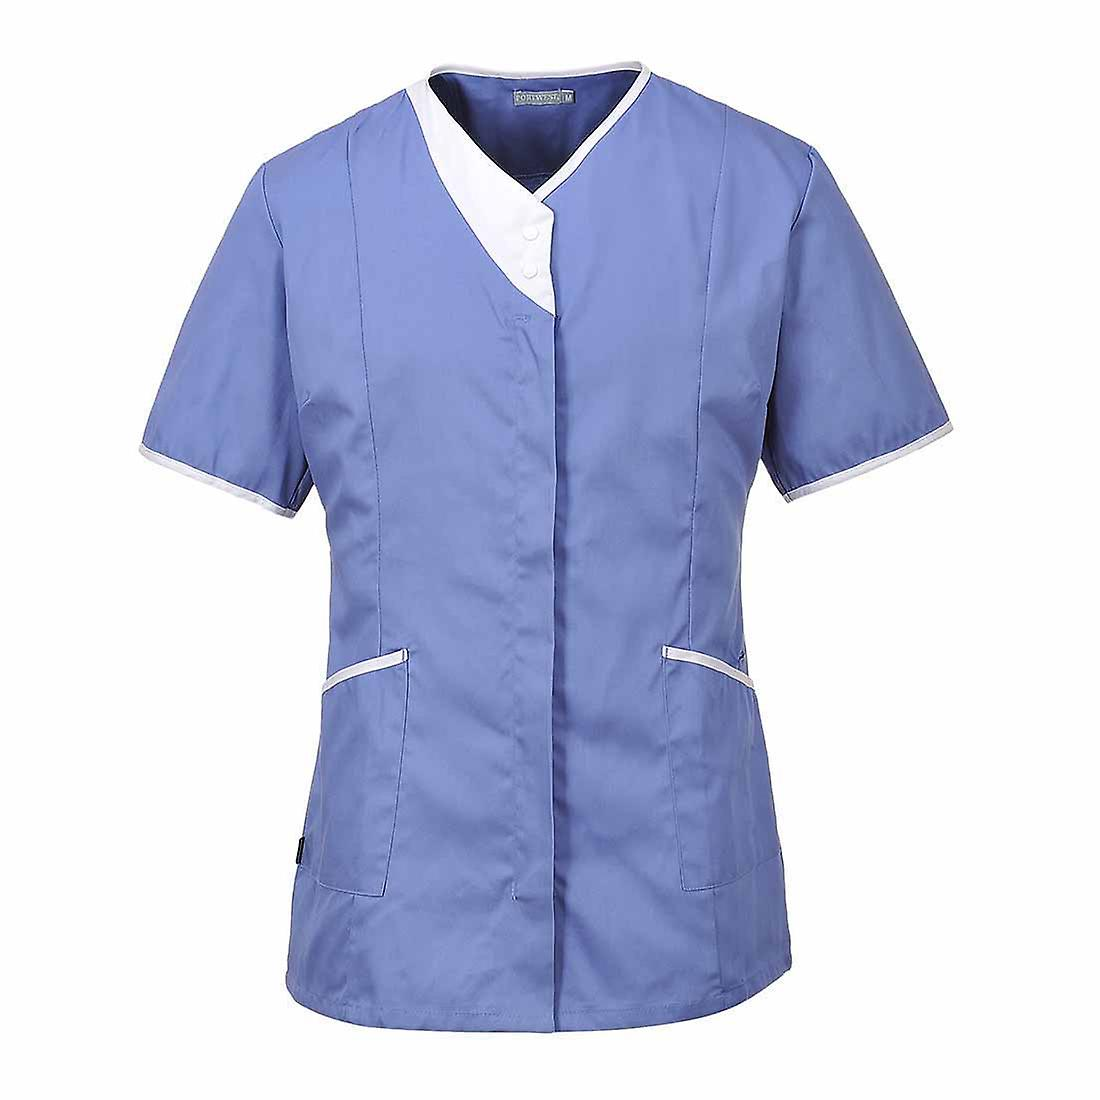 Portwest - Modern Heath Care Workwear Tunic Jacket Top